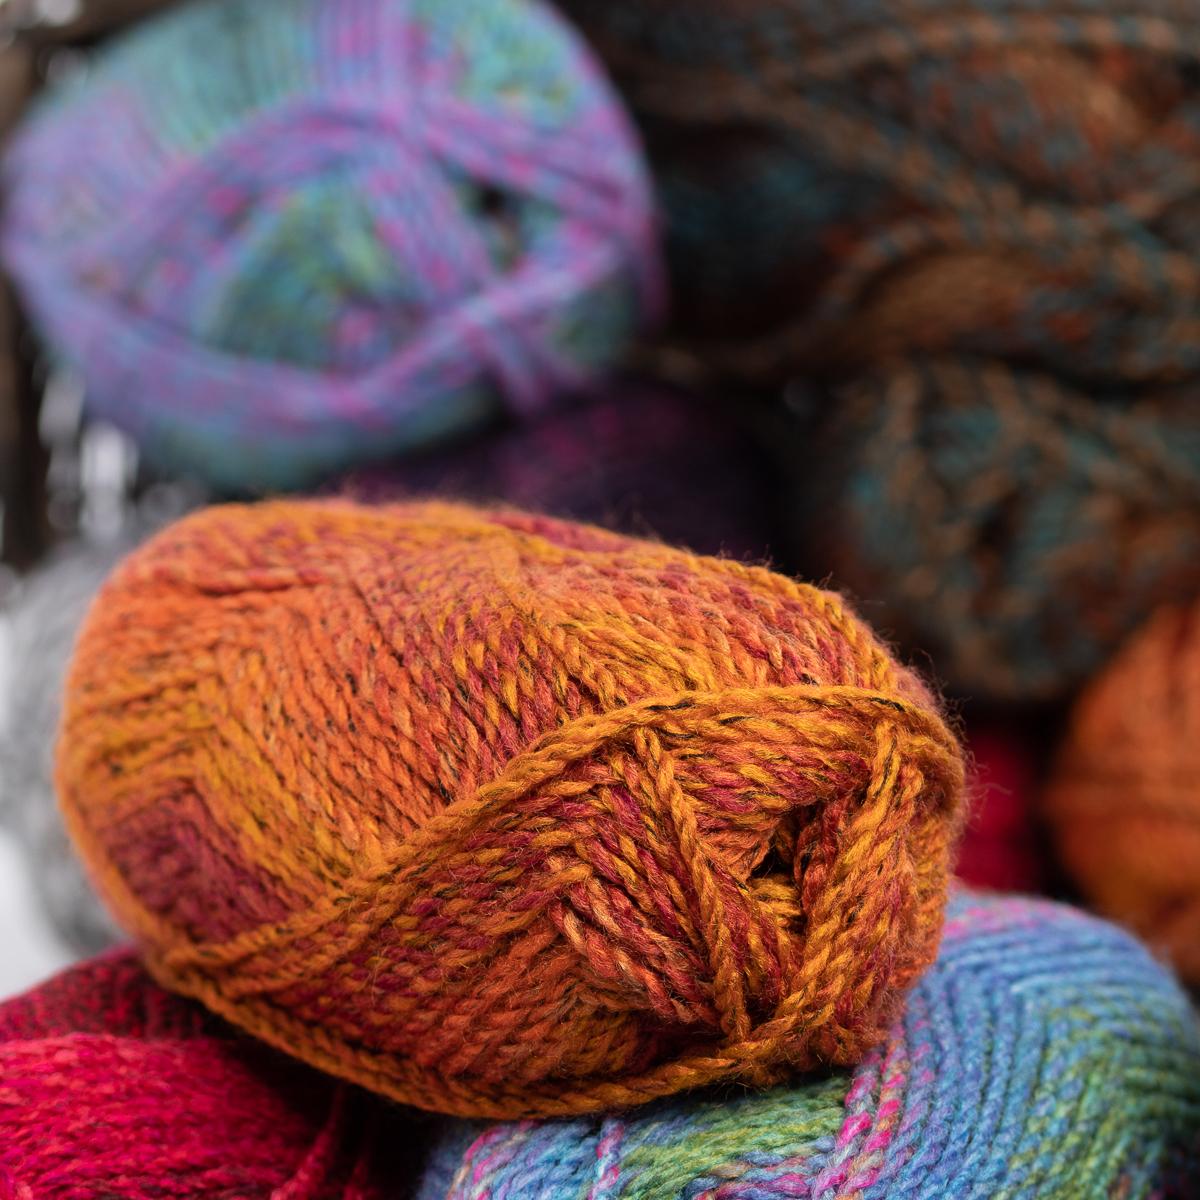 3pk-Lion-Brand-Yarn-100-Acrylic-Chunky-Yarn-Bulky-5-Soft-Knitting-Crocheting thumbnail 23